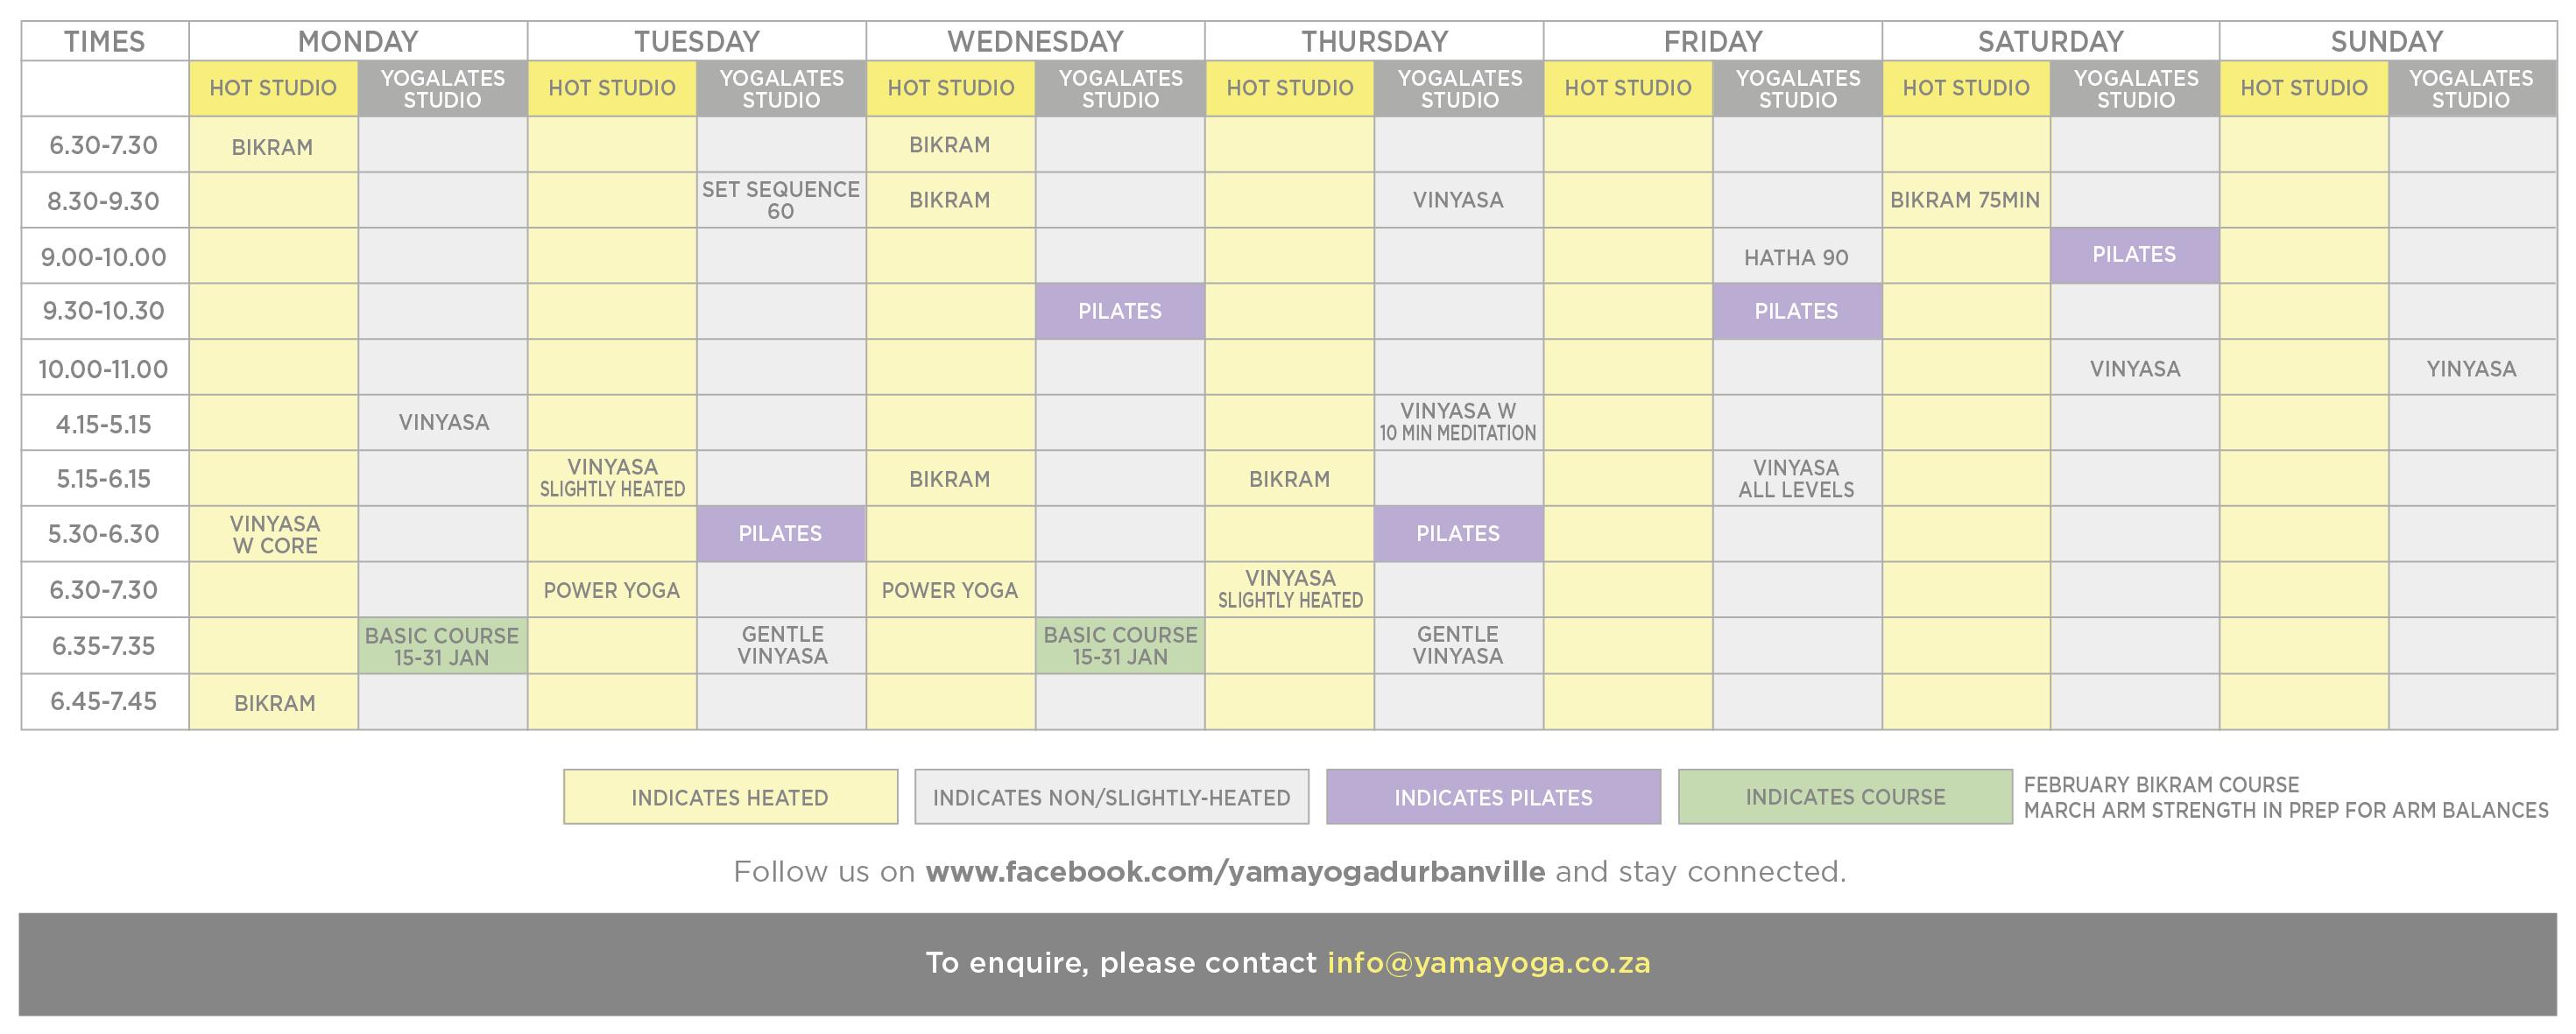 yama-yoga-schedule-web-jan-2018